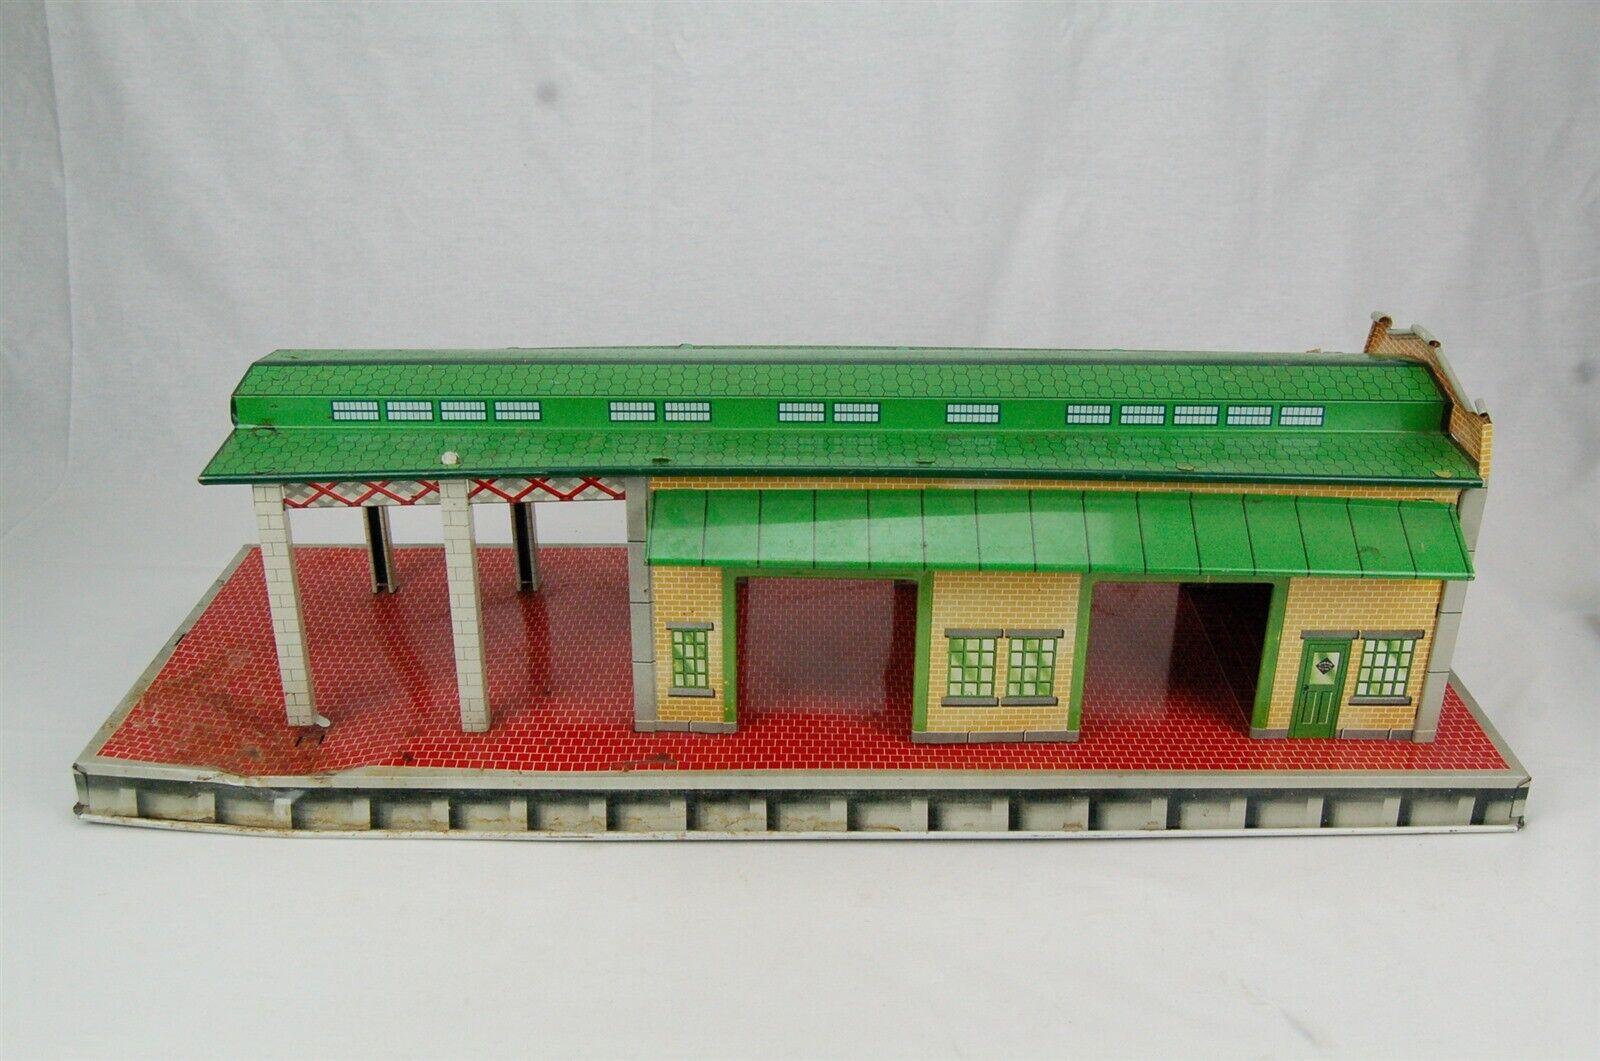 Marx Freight Terminal Tin Litho Train Station Toy Building Vintage 1950s